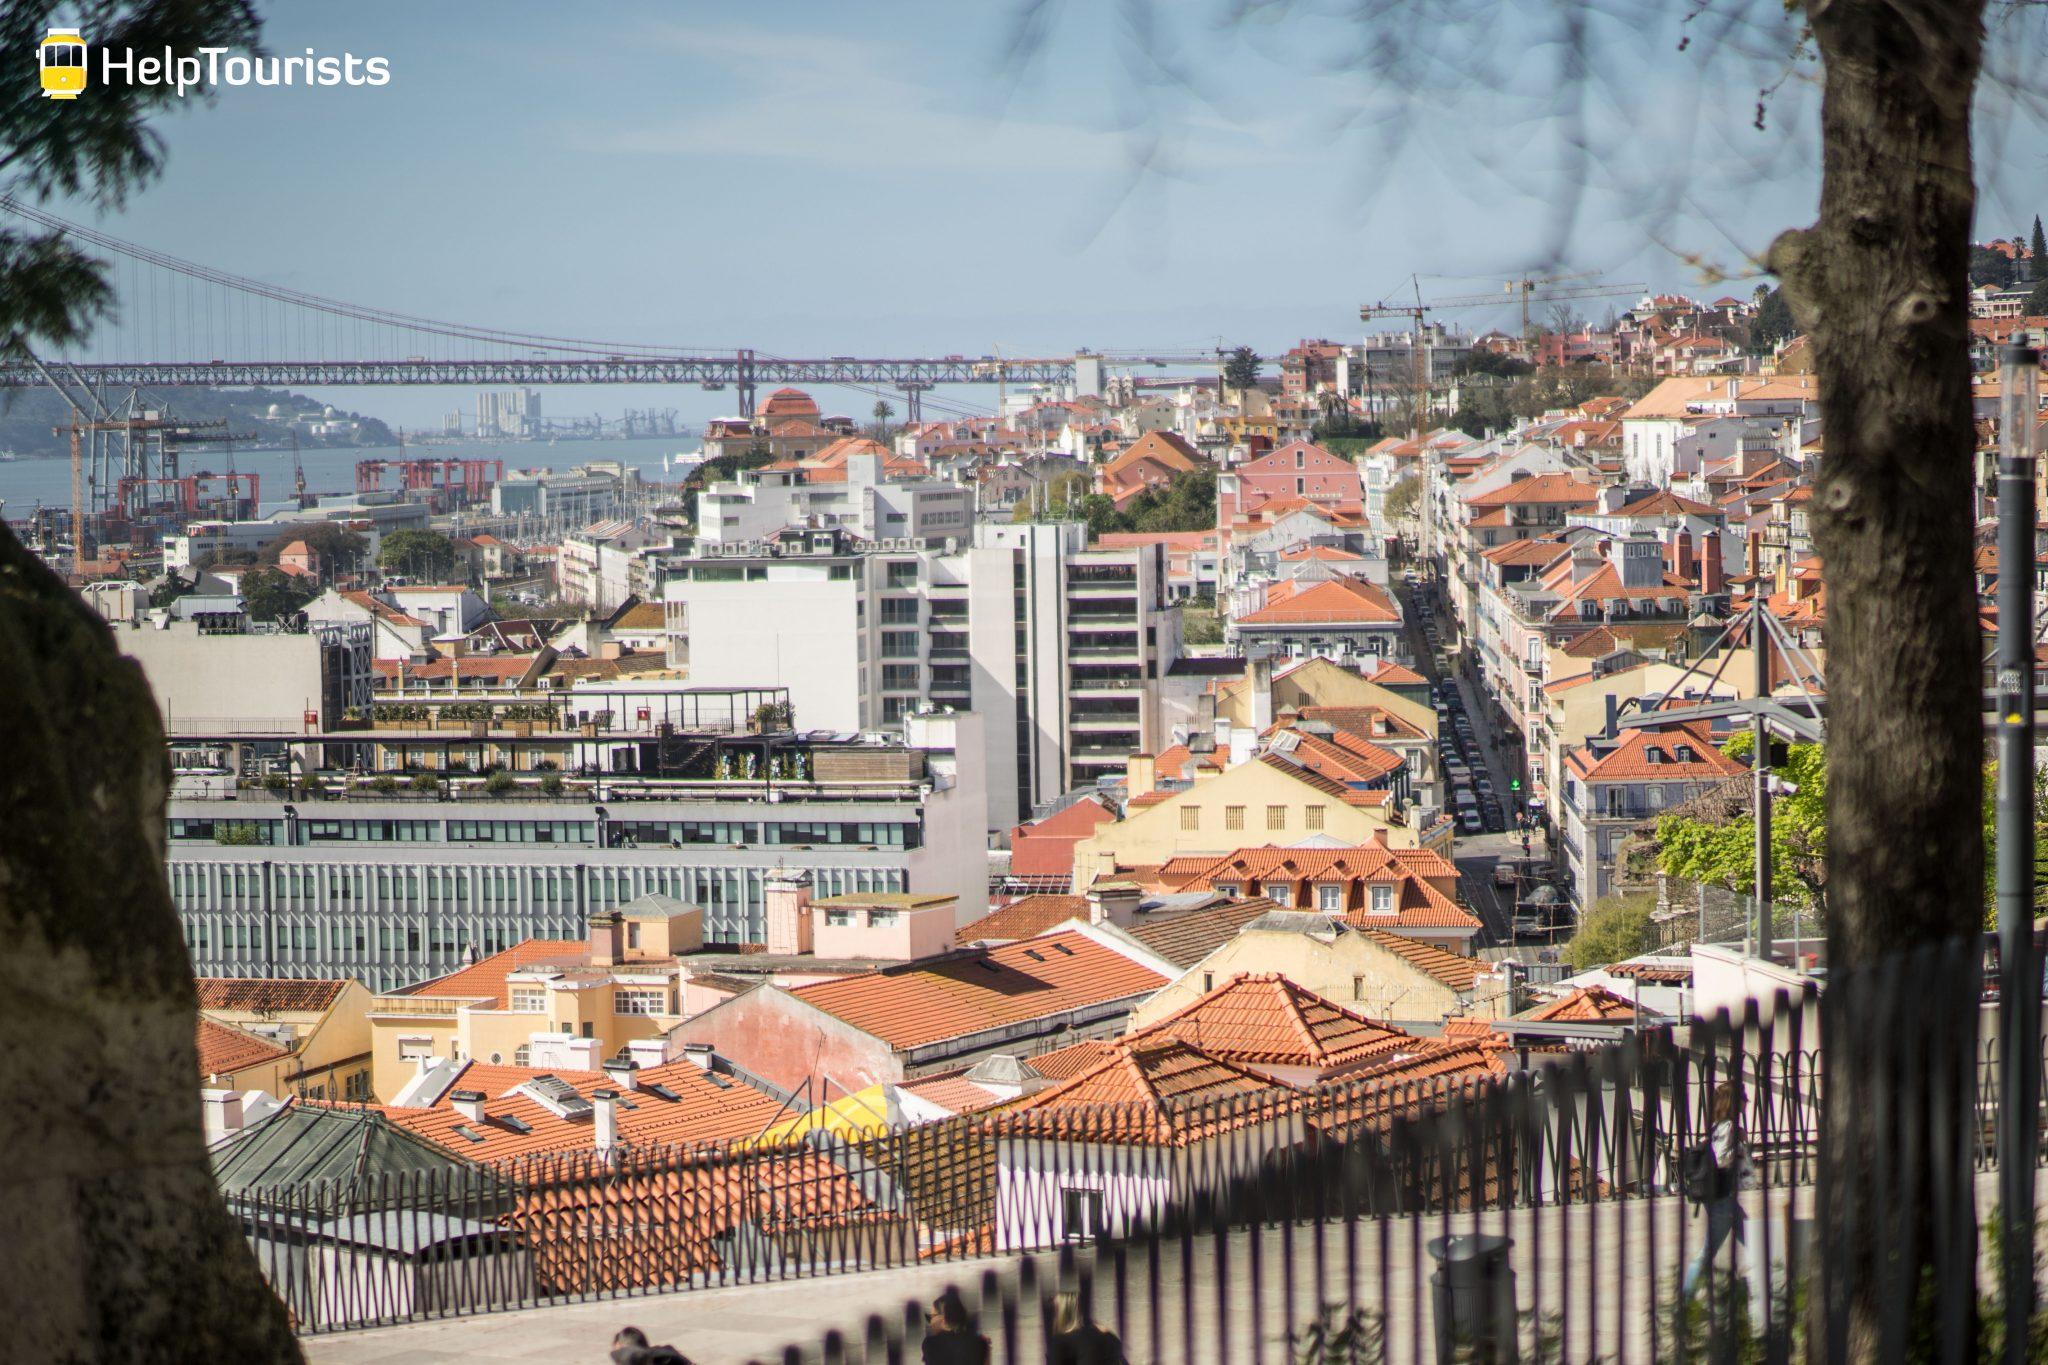 Lissabon_Miradouro-de-Santa-Catarina_Aussicht-Stadt